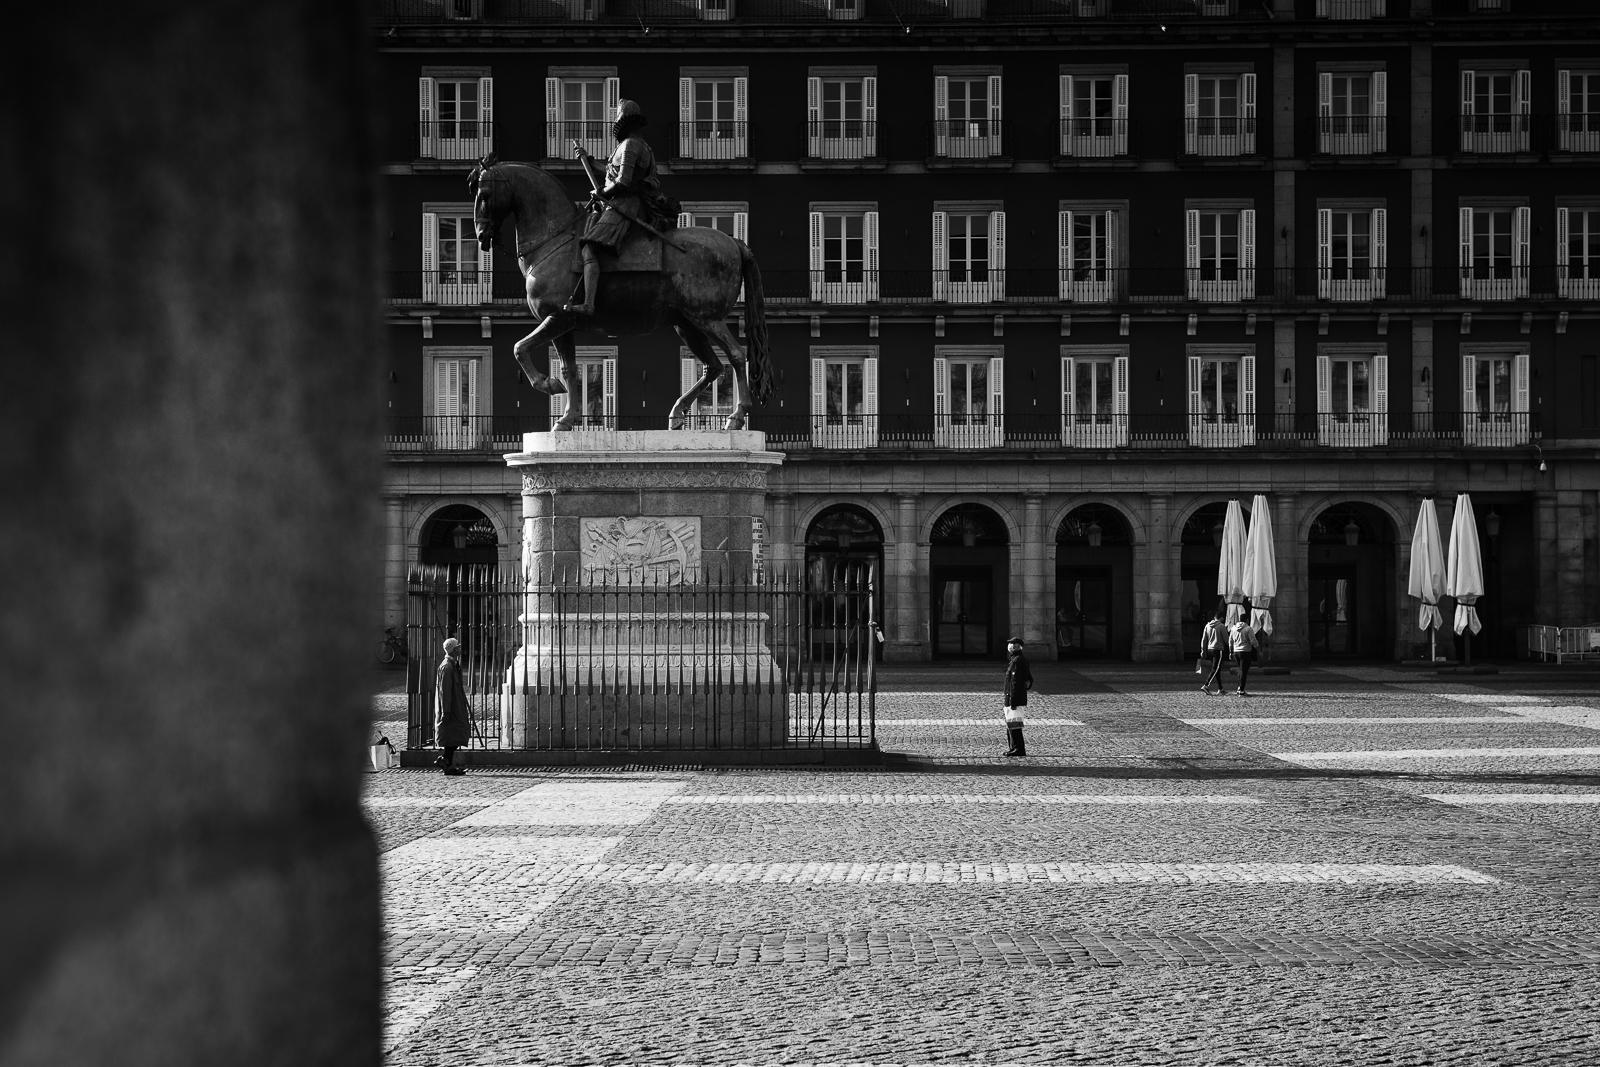 Plaza Mayor nearly empty during the coronavirus lockdown in Madrid, Spain.